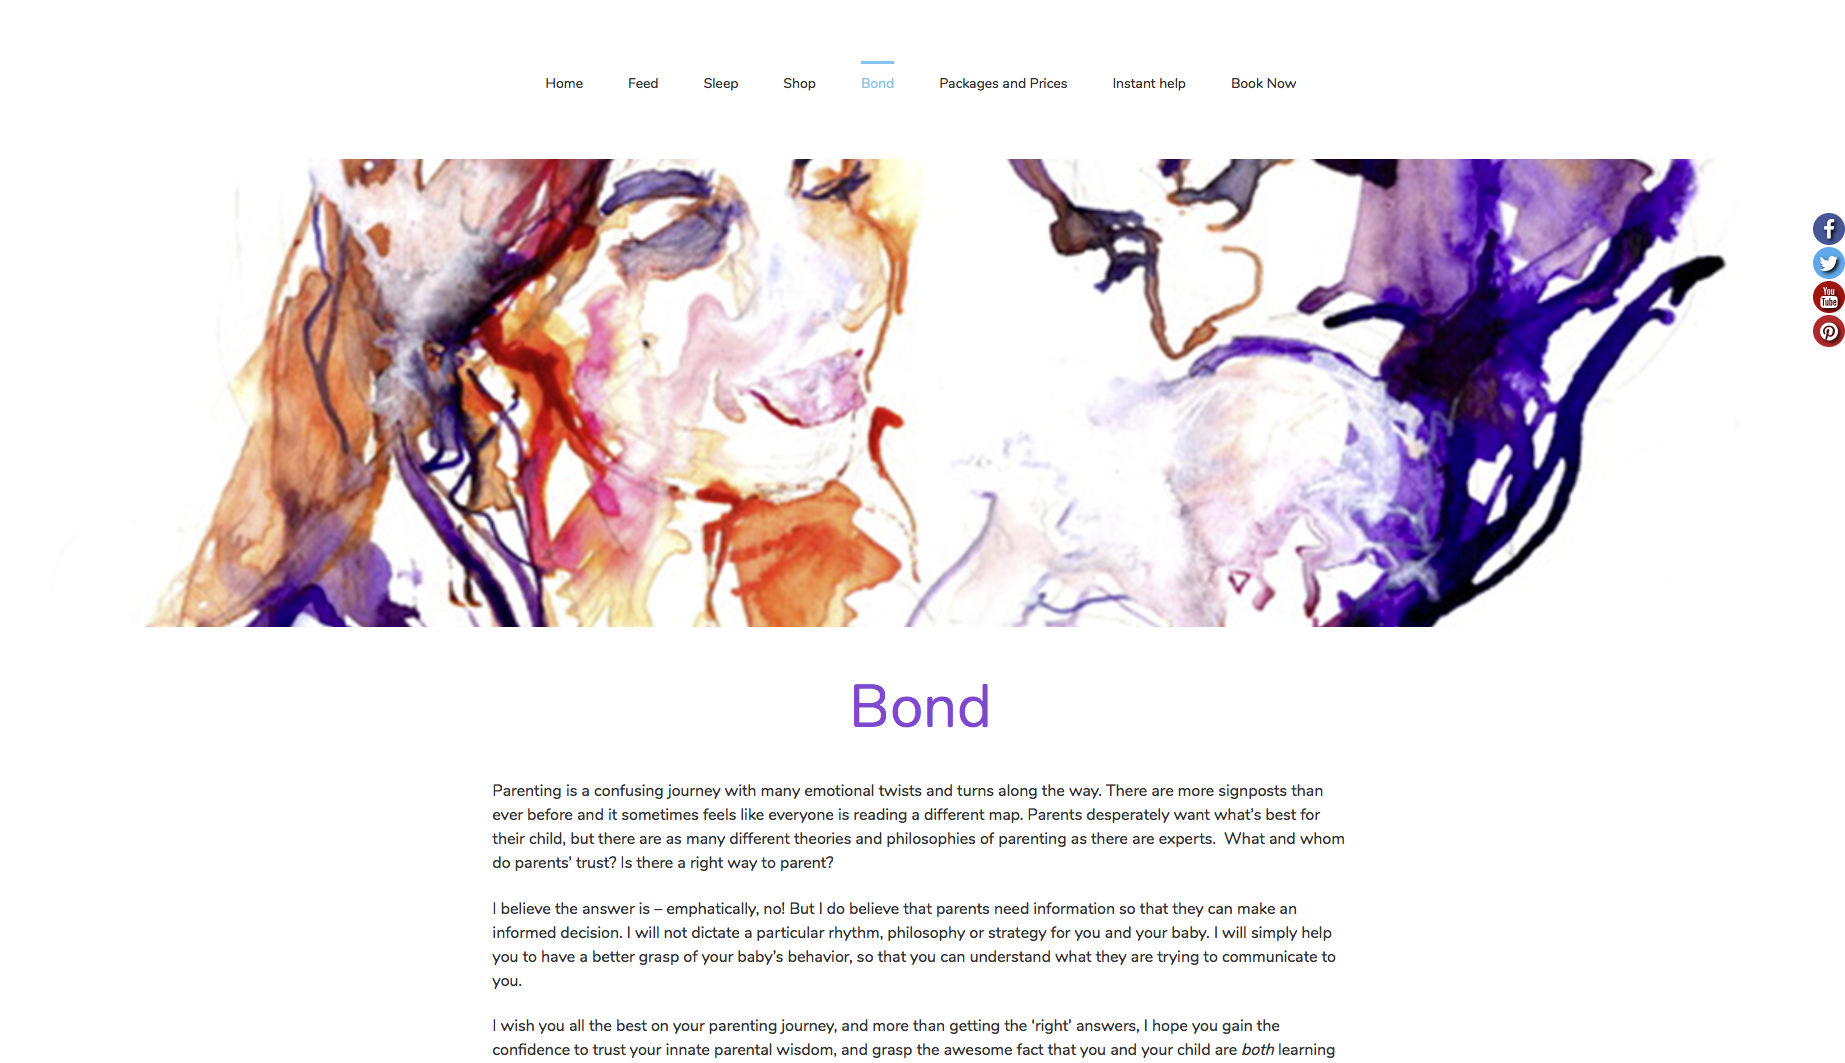 Bond page from feed sleep bond website